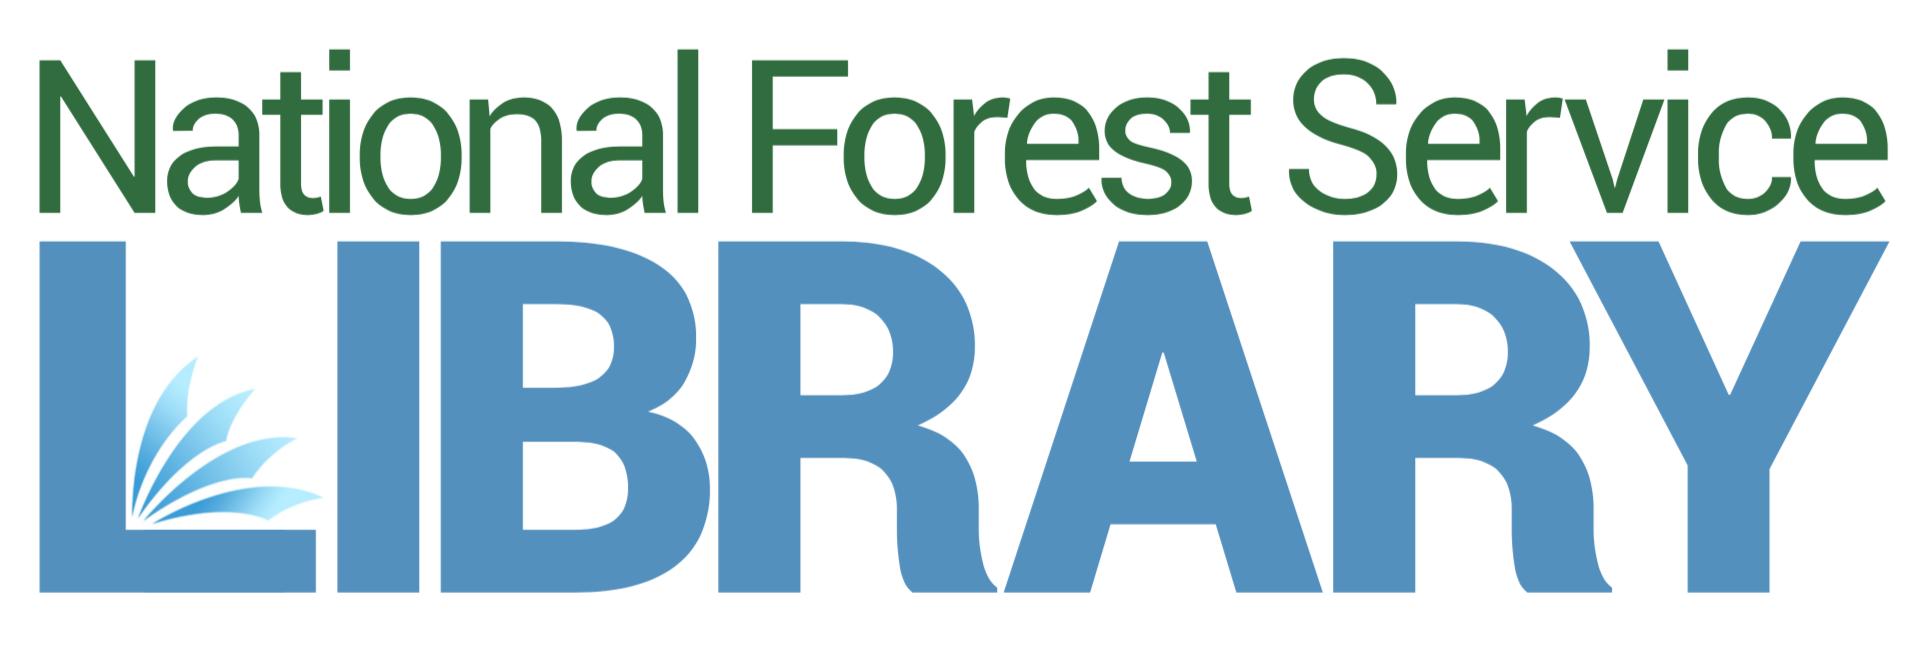 NFSL_logo.png